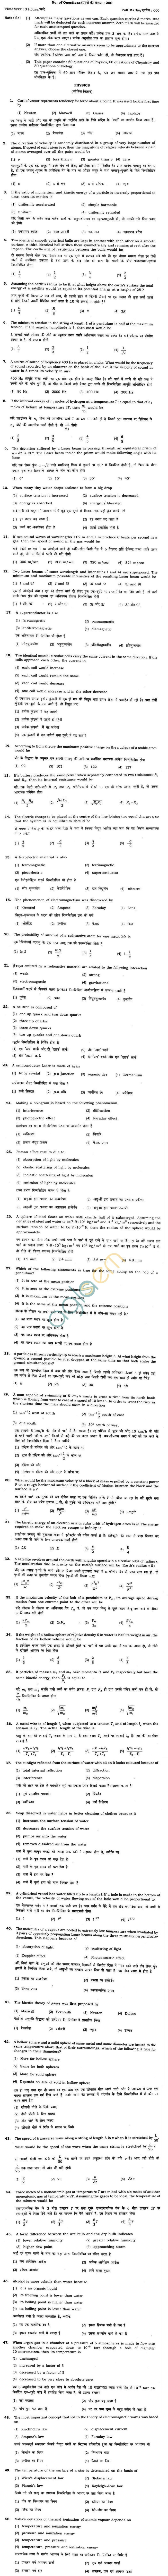 BHU UET 2013B.V.Sc.Question Paper